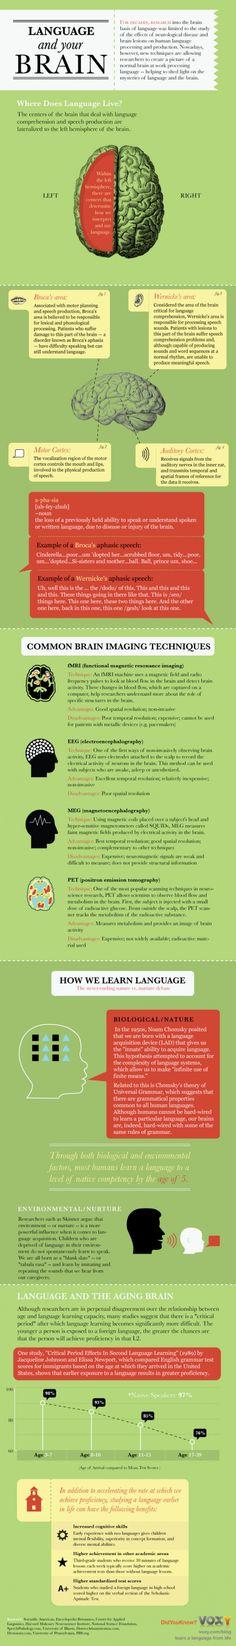 Language and the brain.